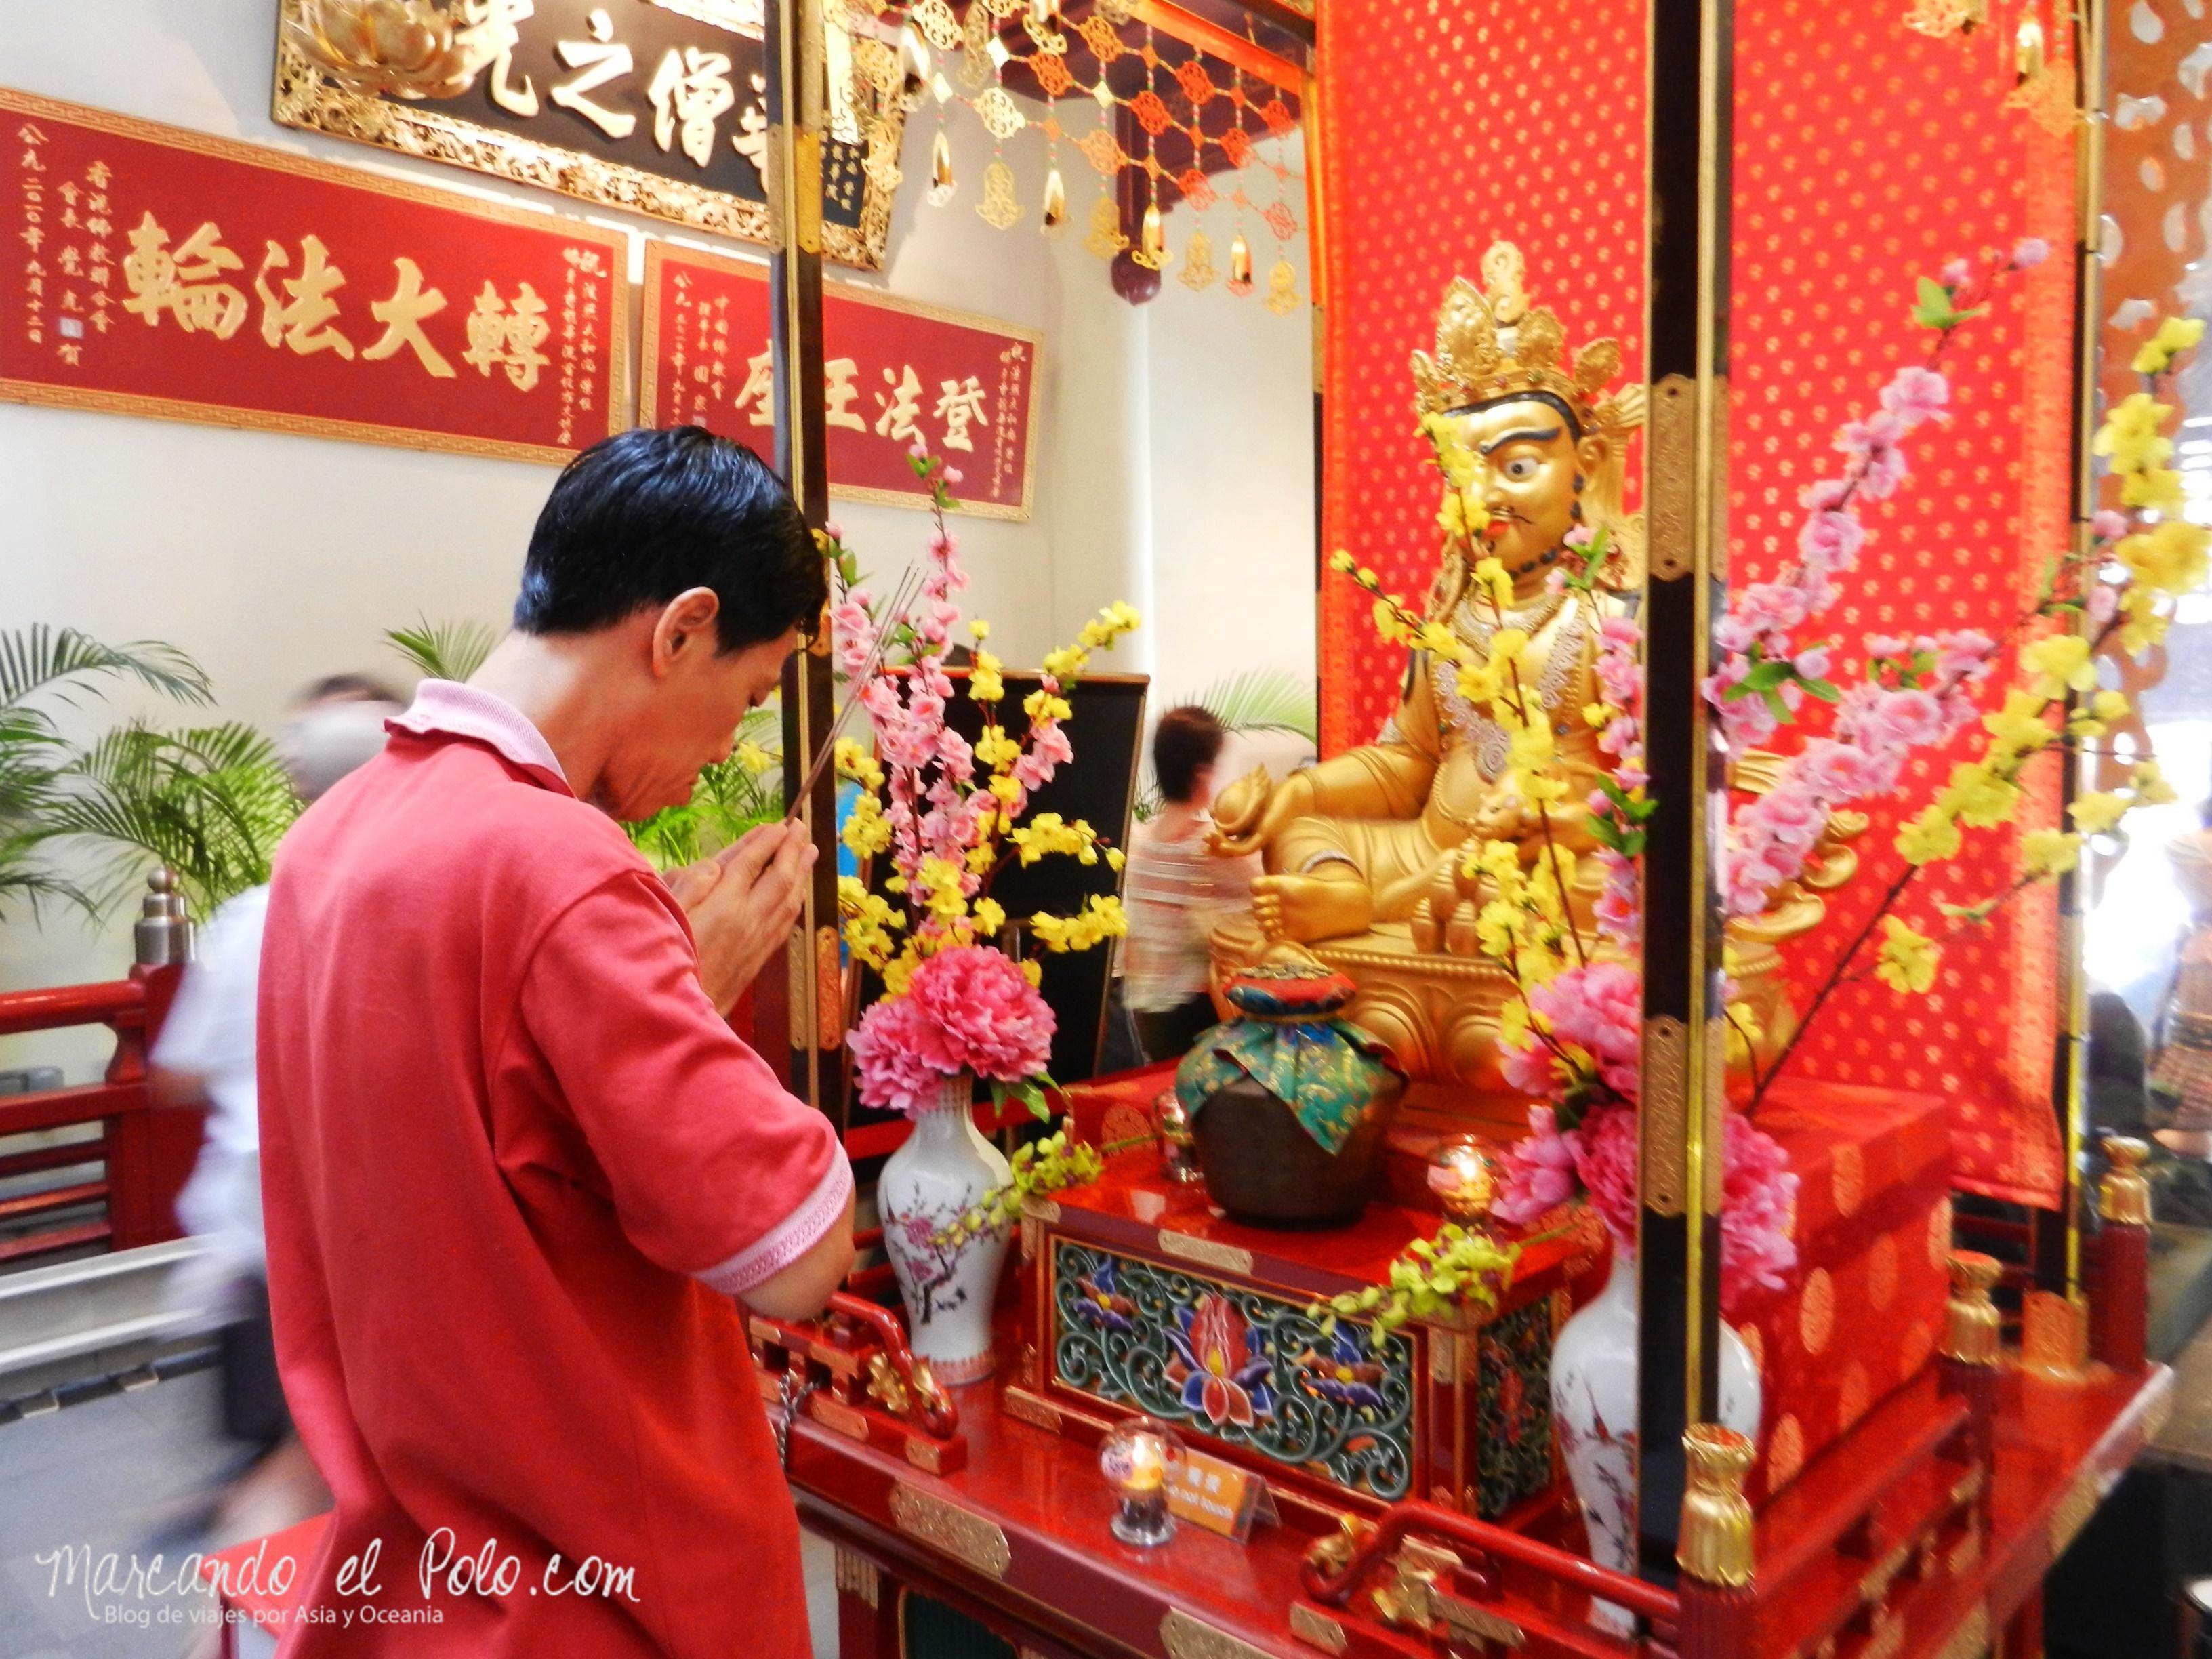 Rezando en el Templo Budista, Singapur, Asia